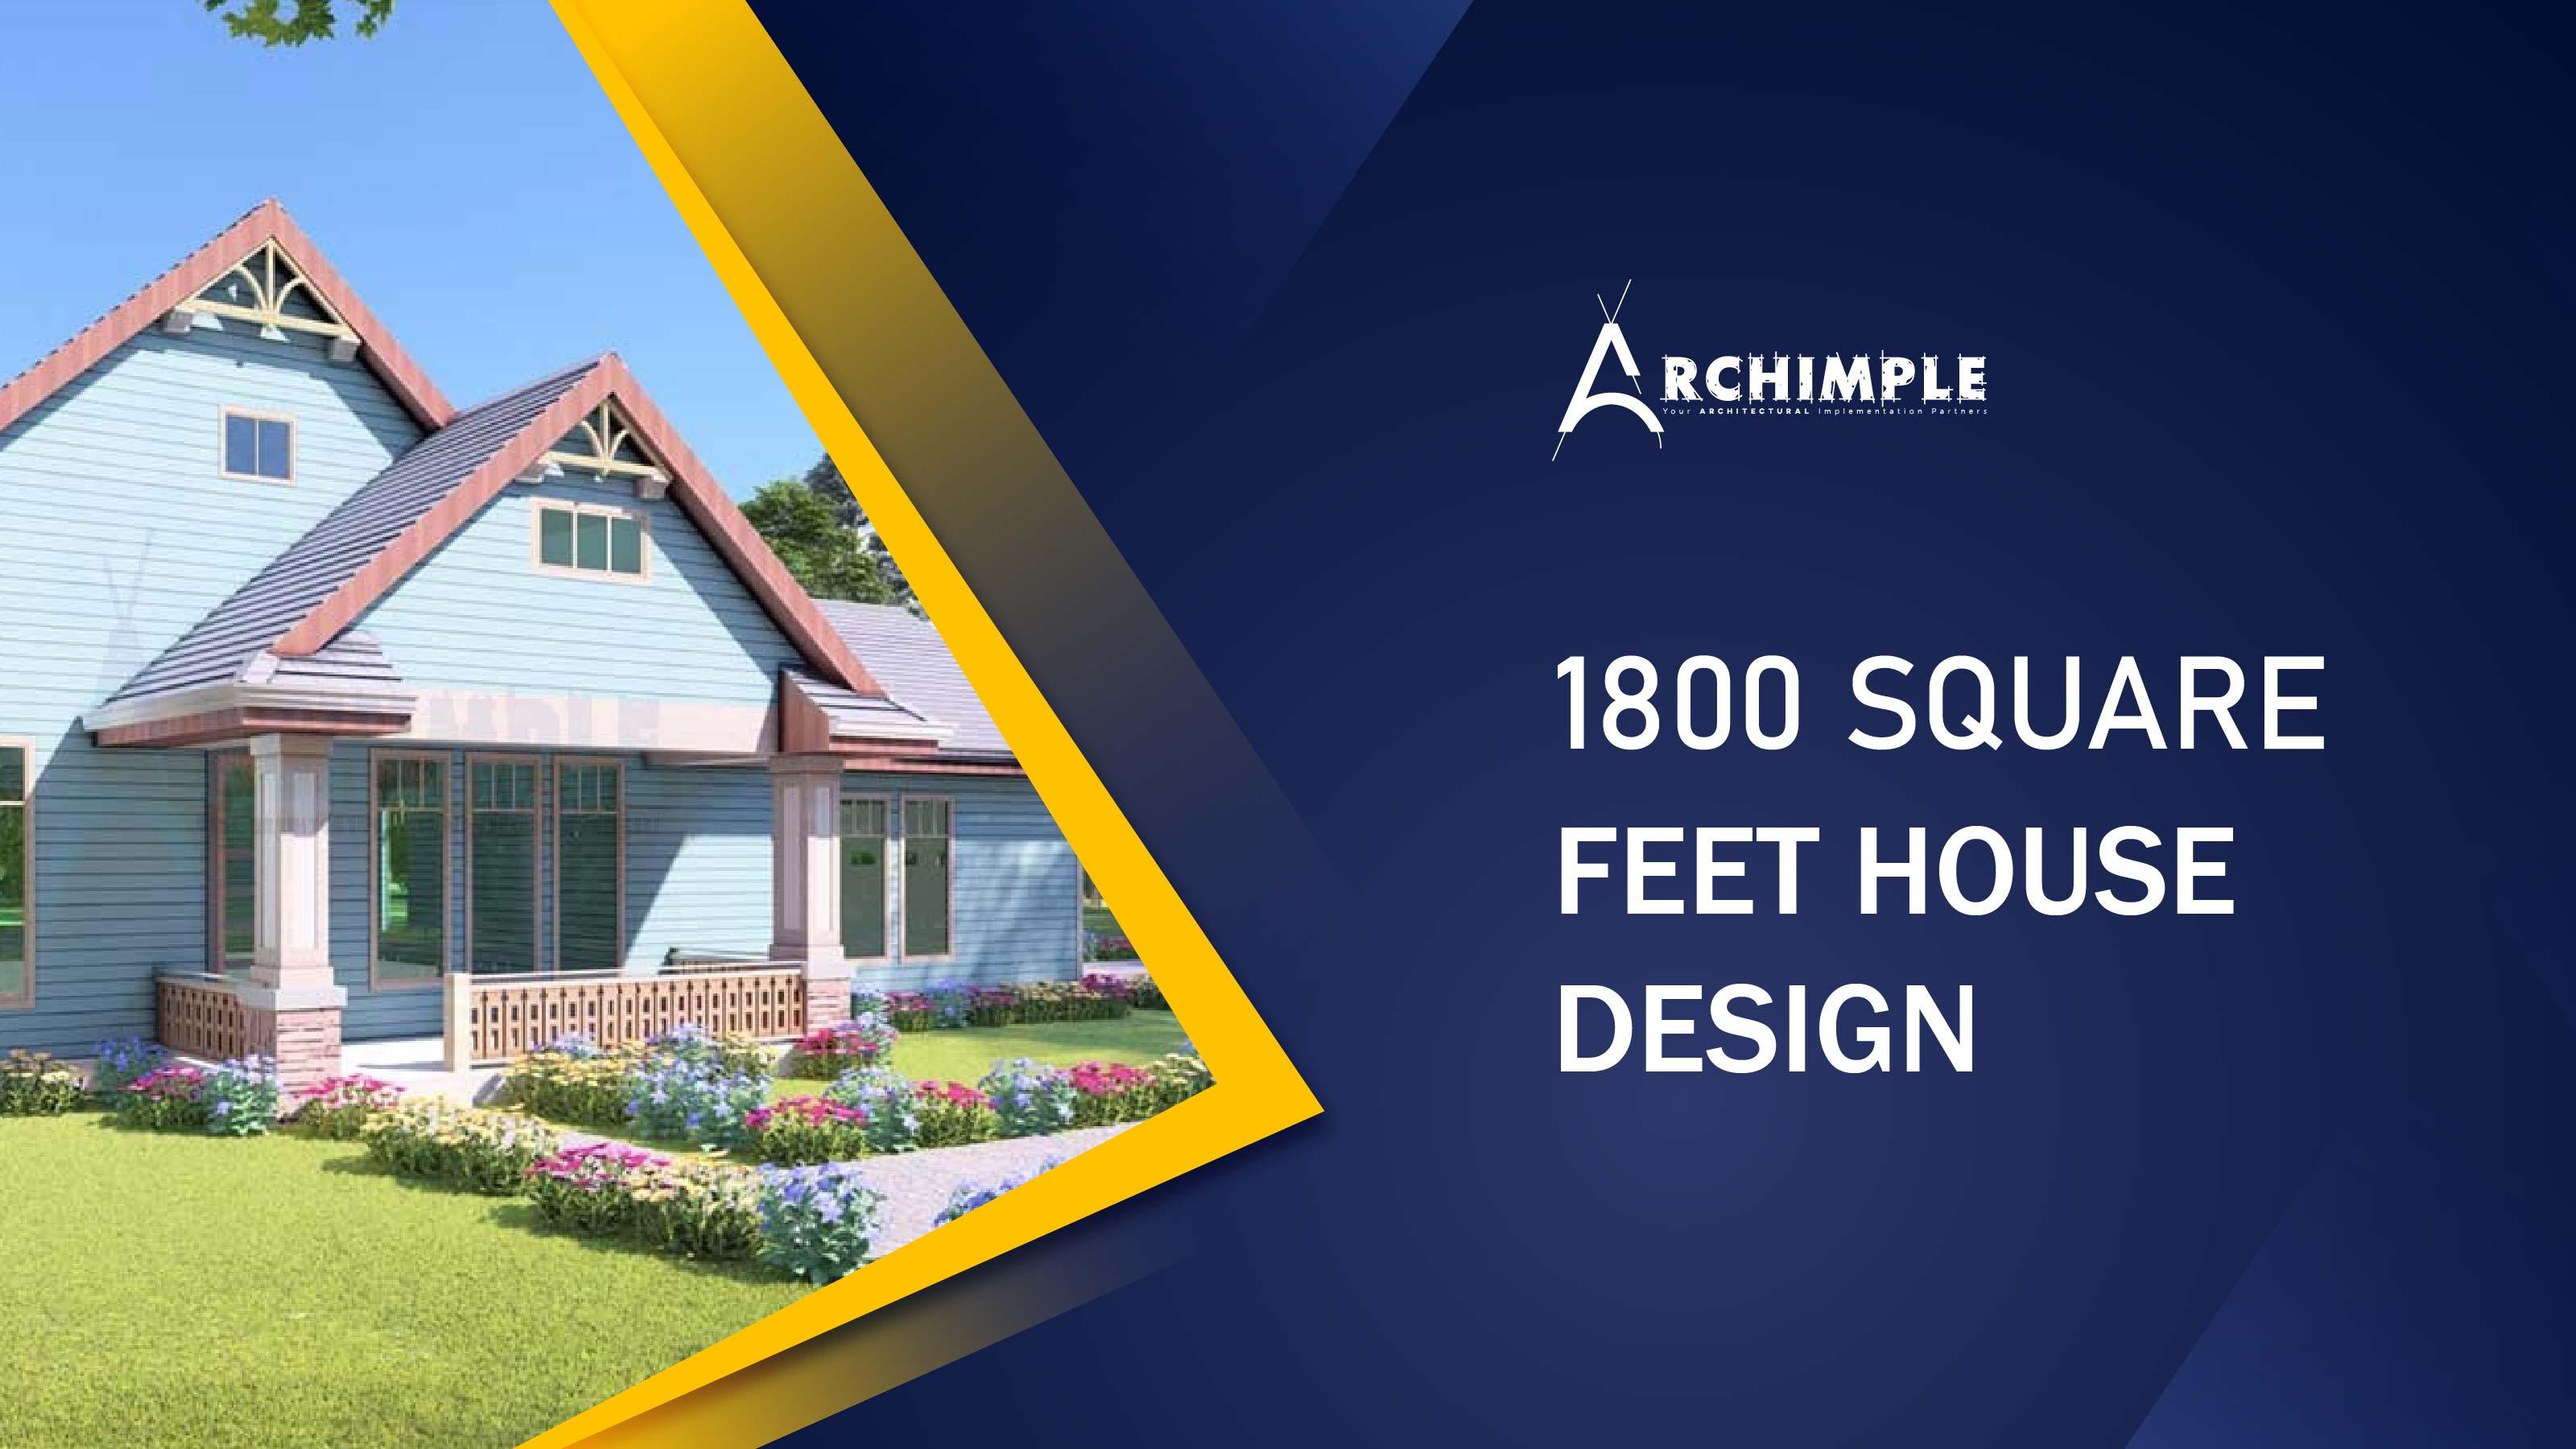 1800 Square Feet House Design